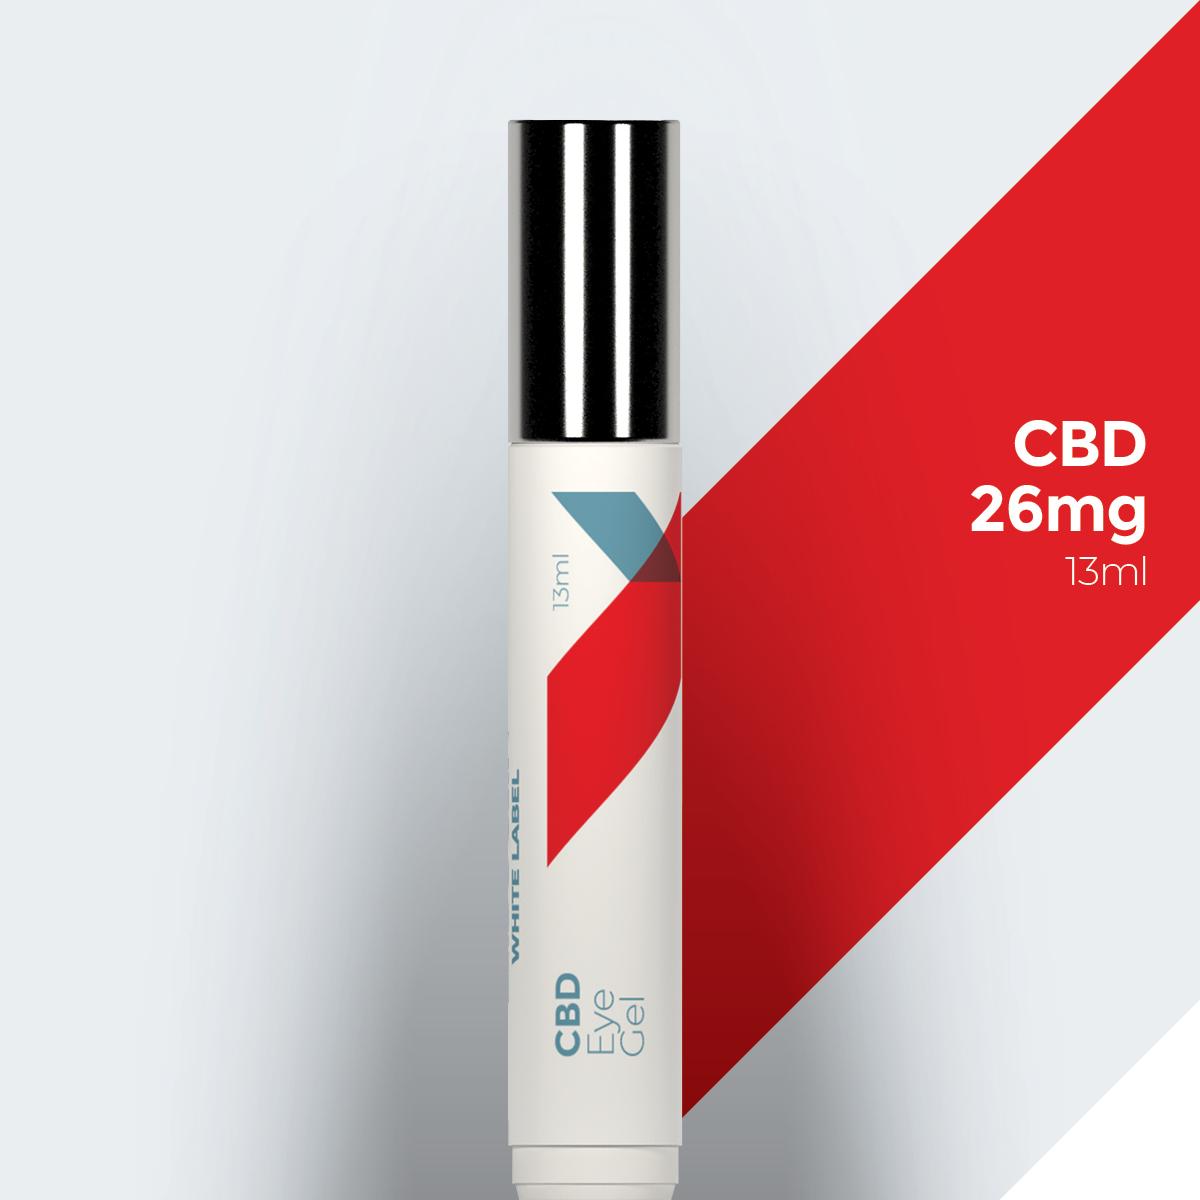 Labocan White label CBD Eye Gel